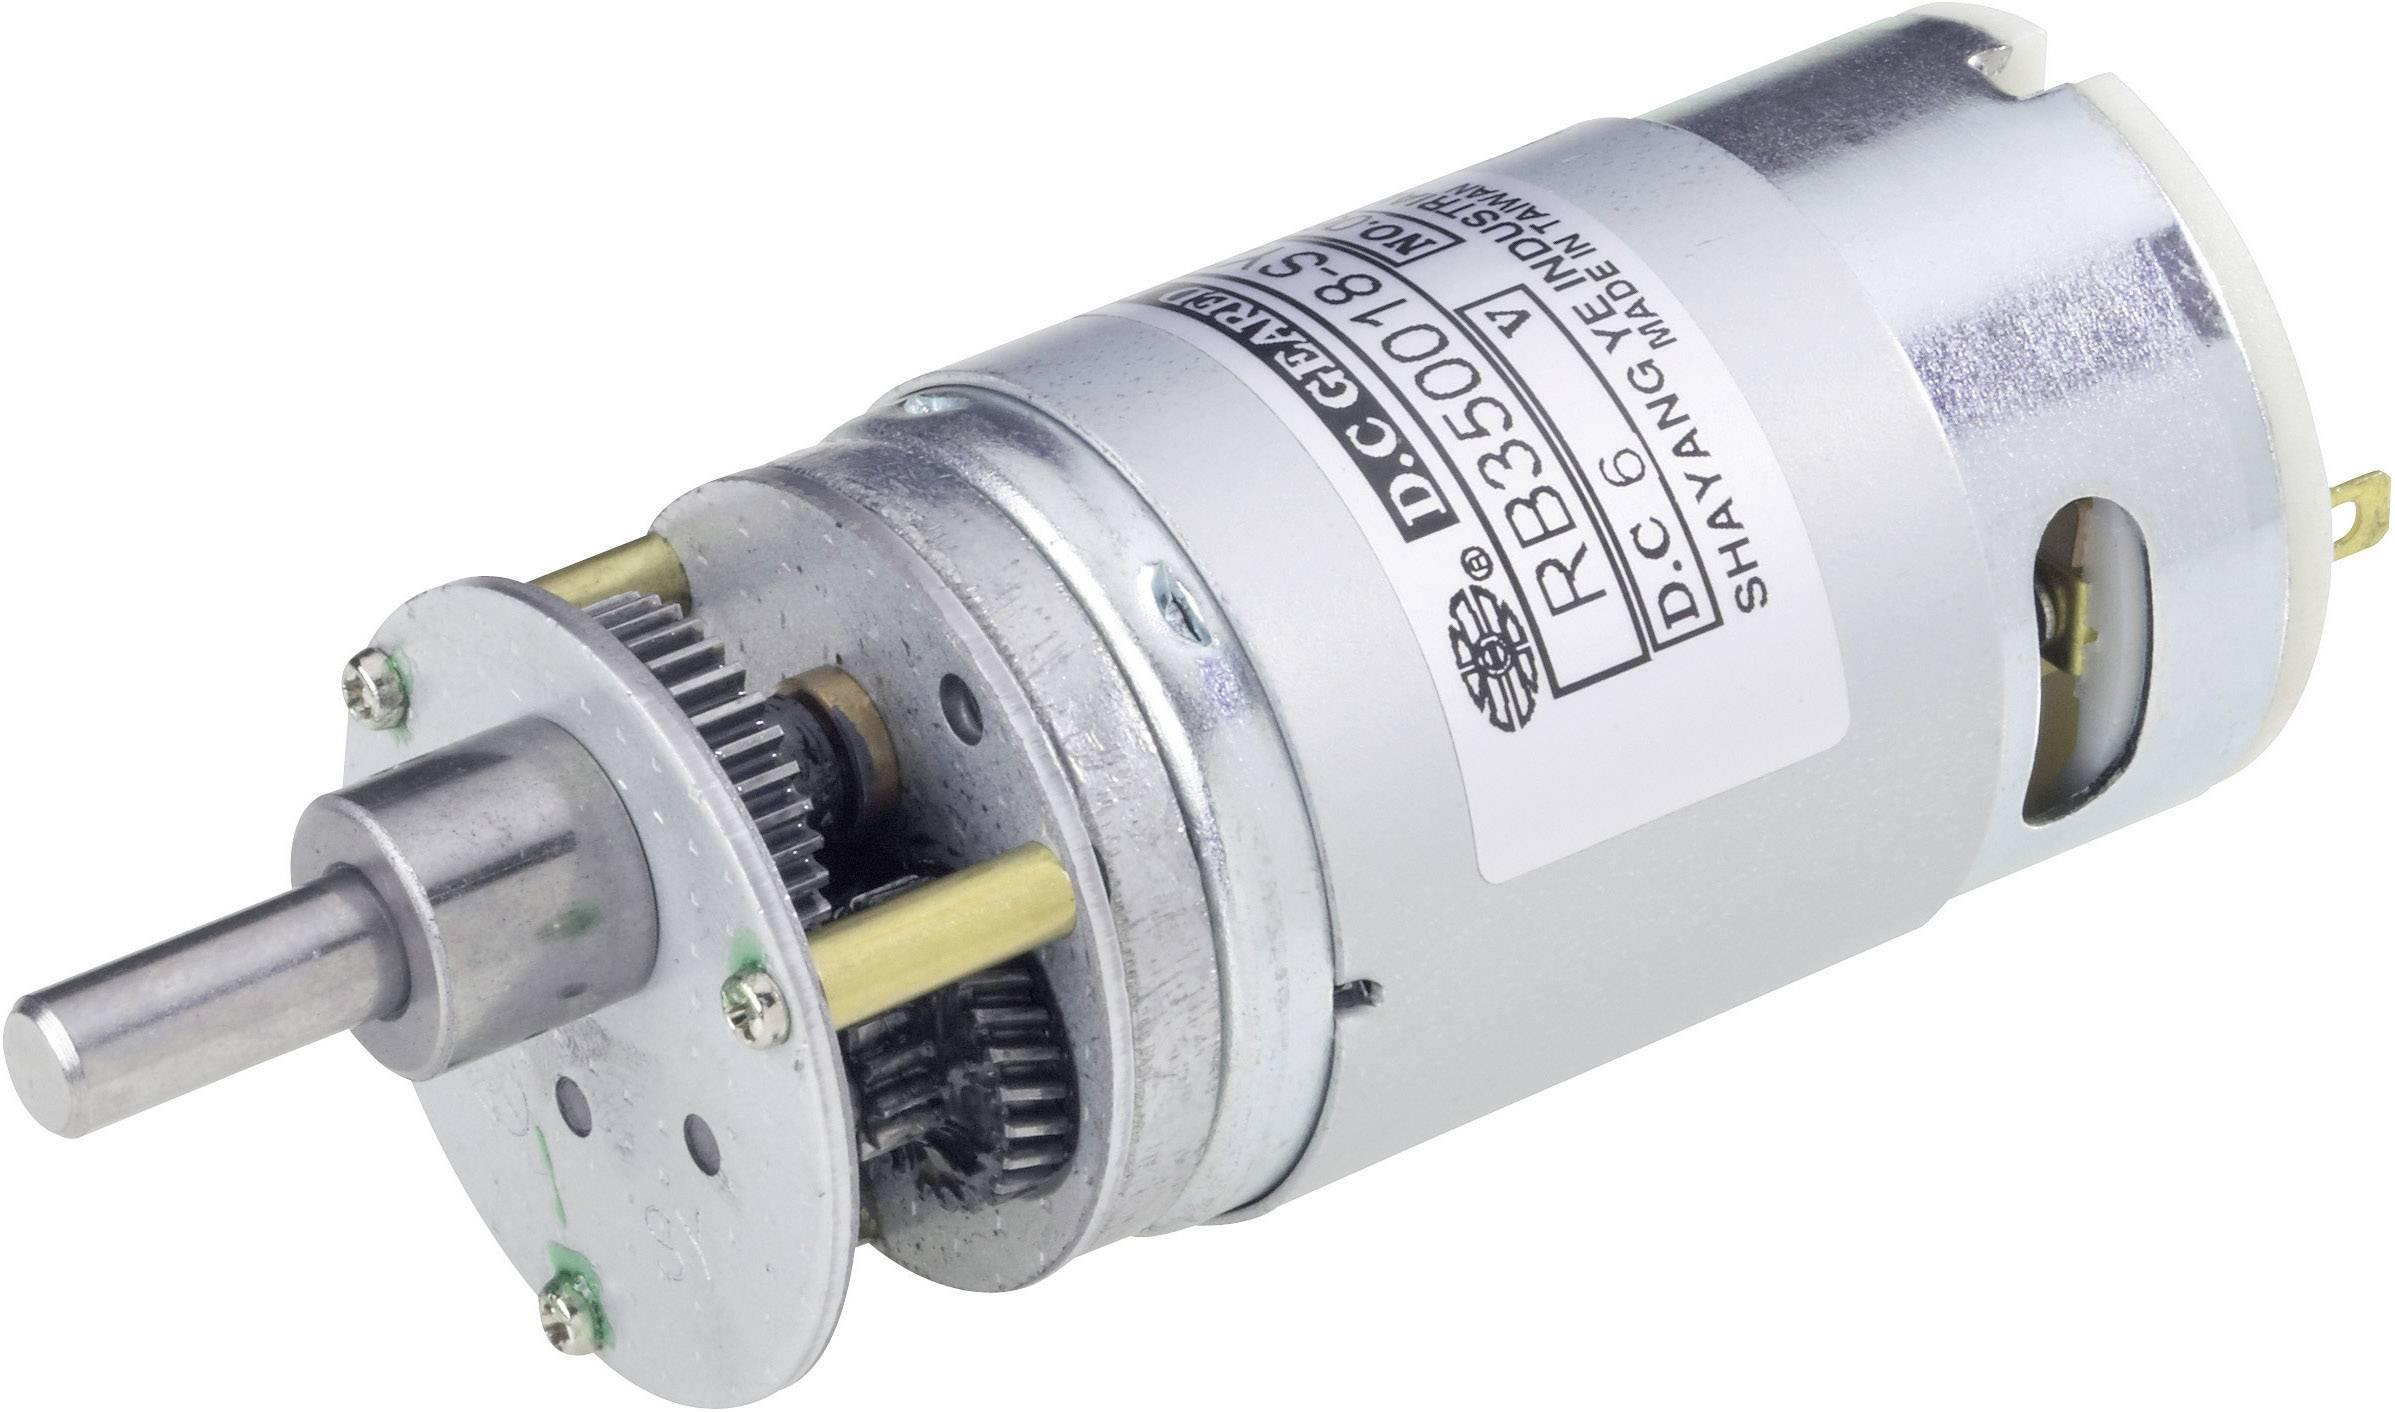 Vysoko výkonný motor Modelcraft RB350050-22H22R, 6 V, 50:1